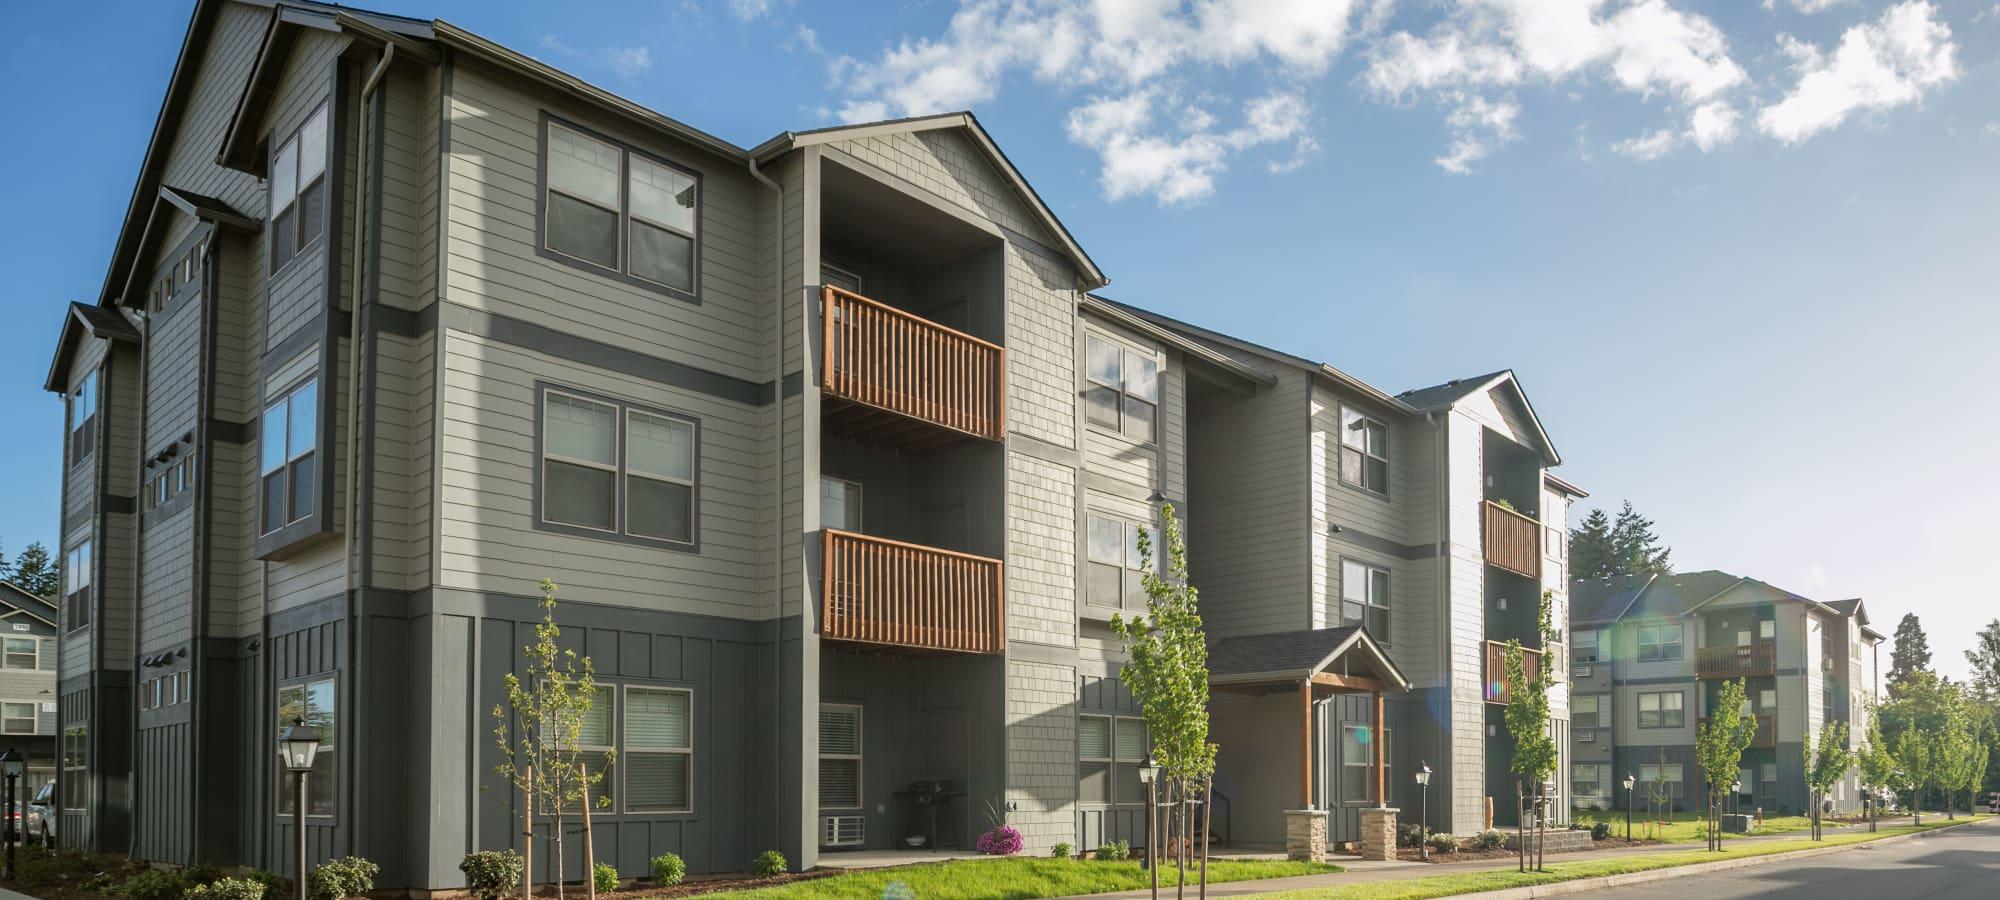 Keizer Station Apartments in Keizer, Oregon